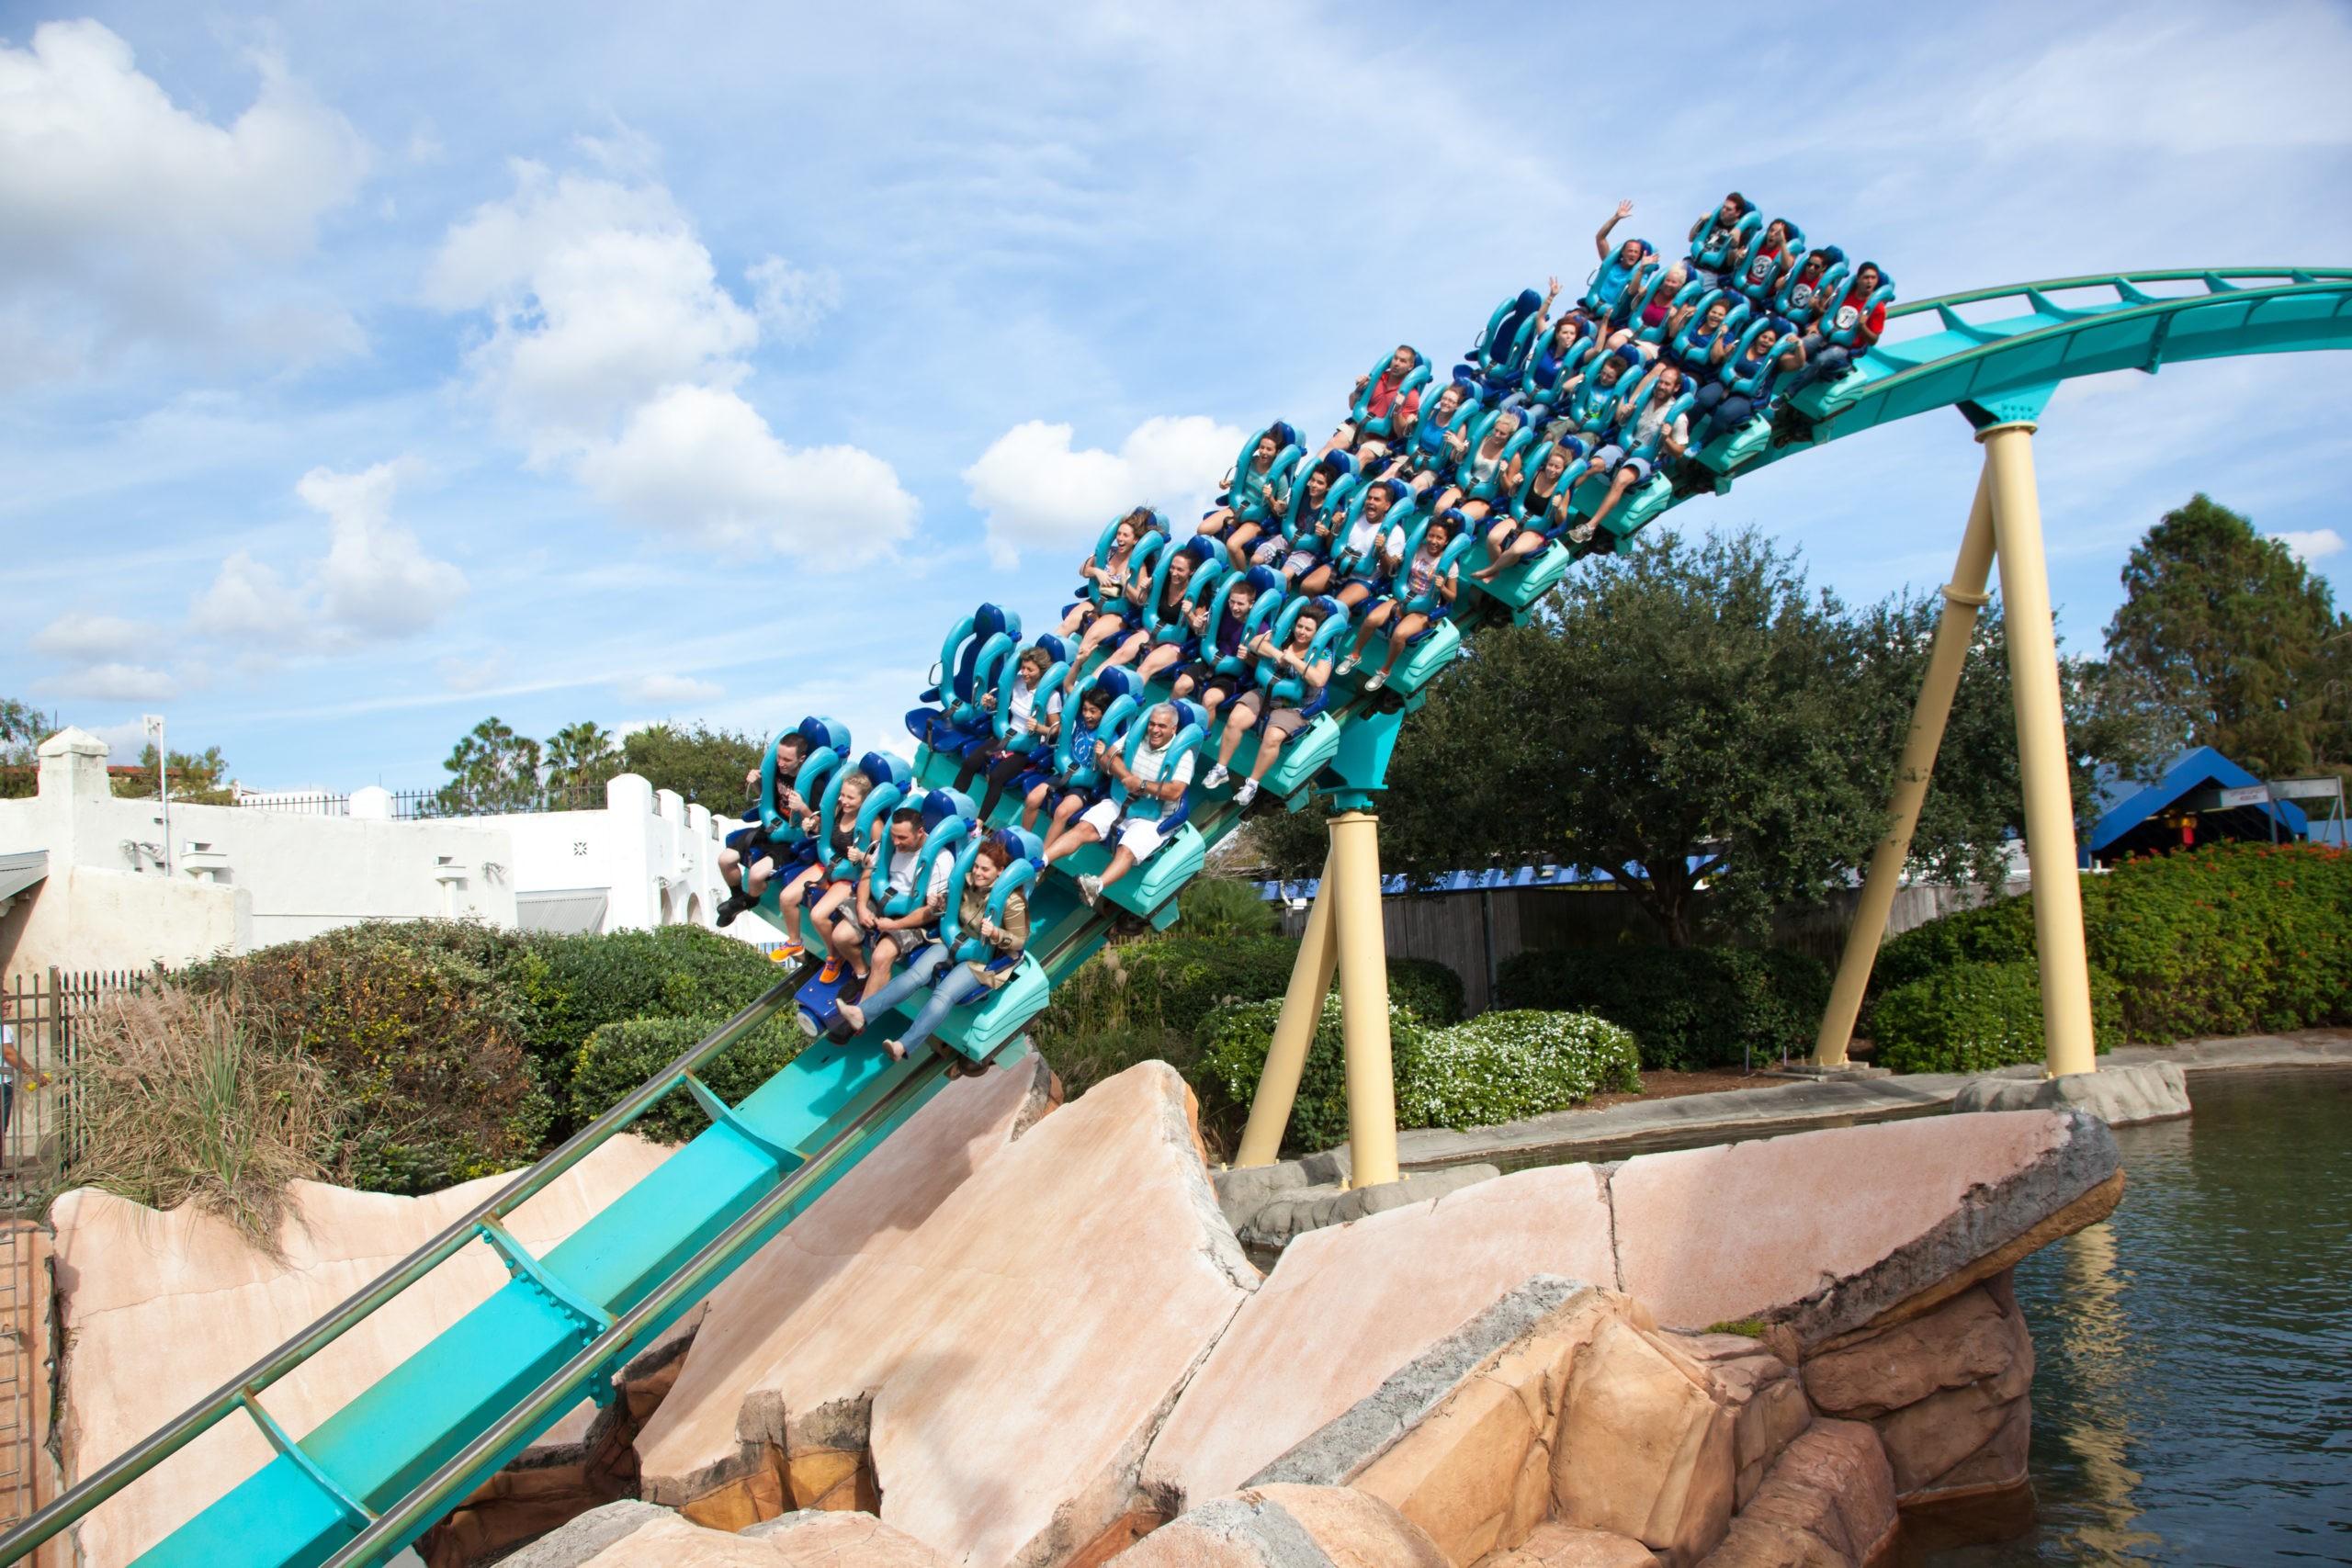 Roller Coaster at Sea World, licencja: shutterstock/By Erin Cadigan